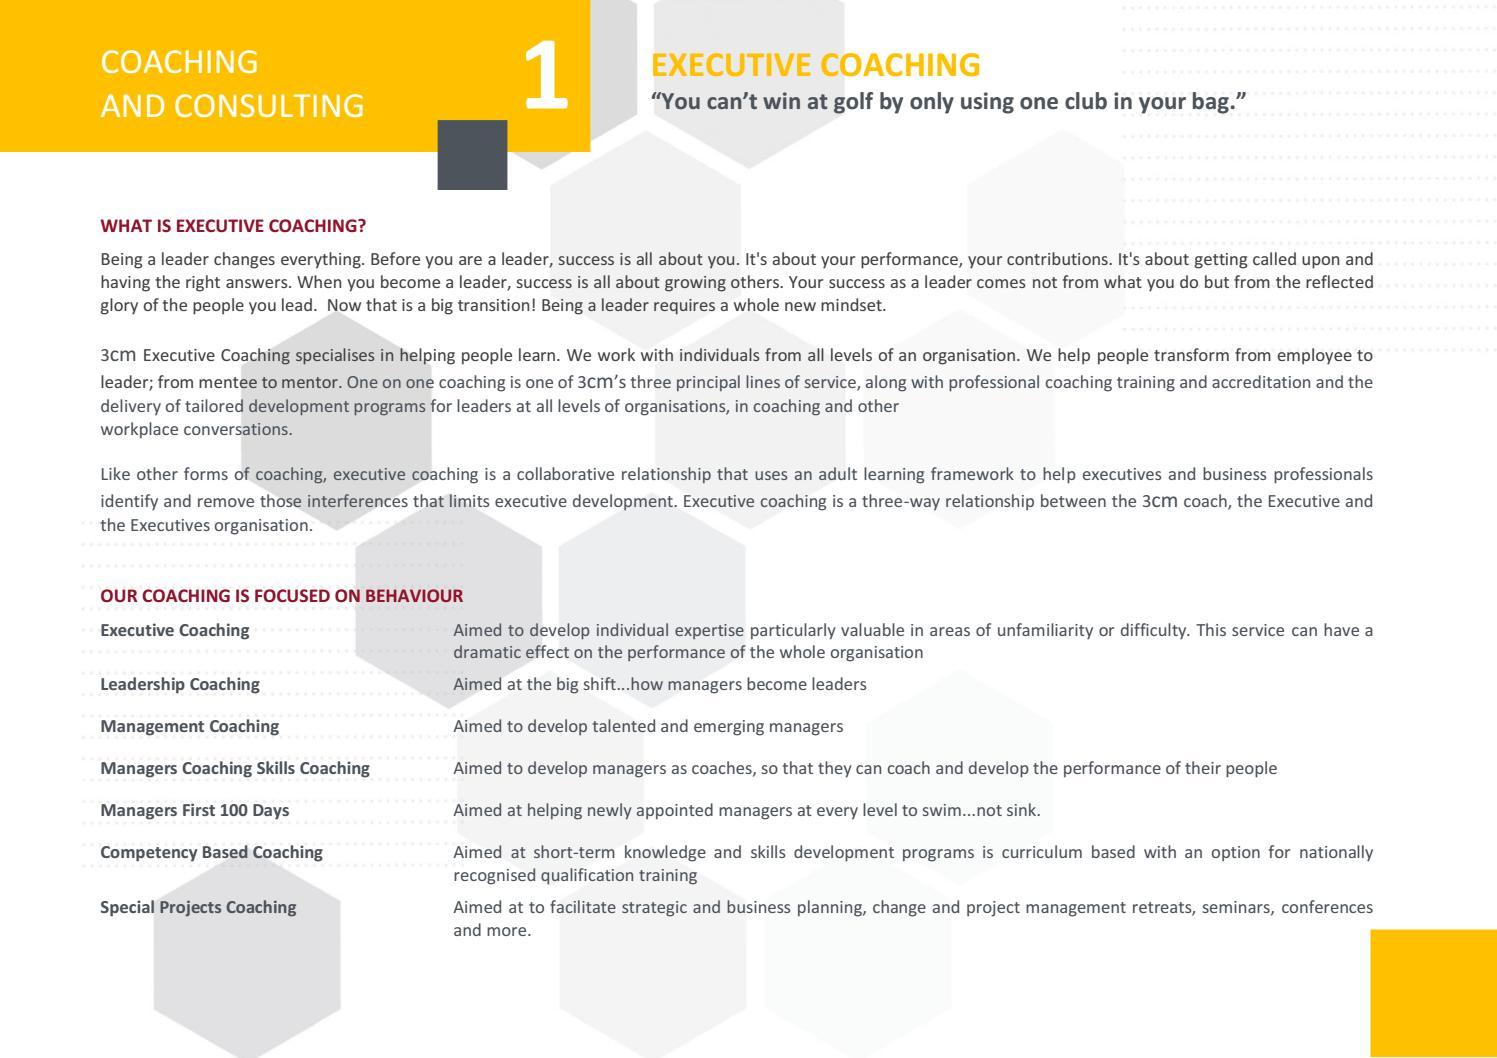 3cm Professional Development Prospectus 2019 By 3cm School Of Management Issuu